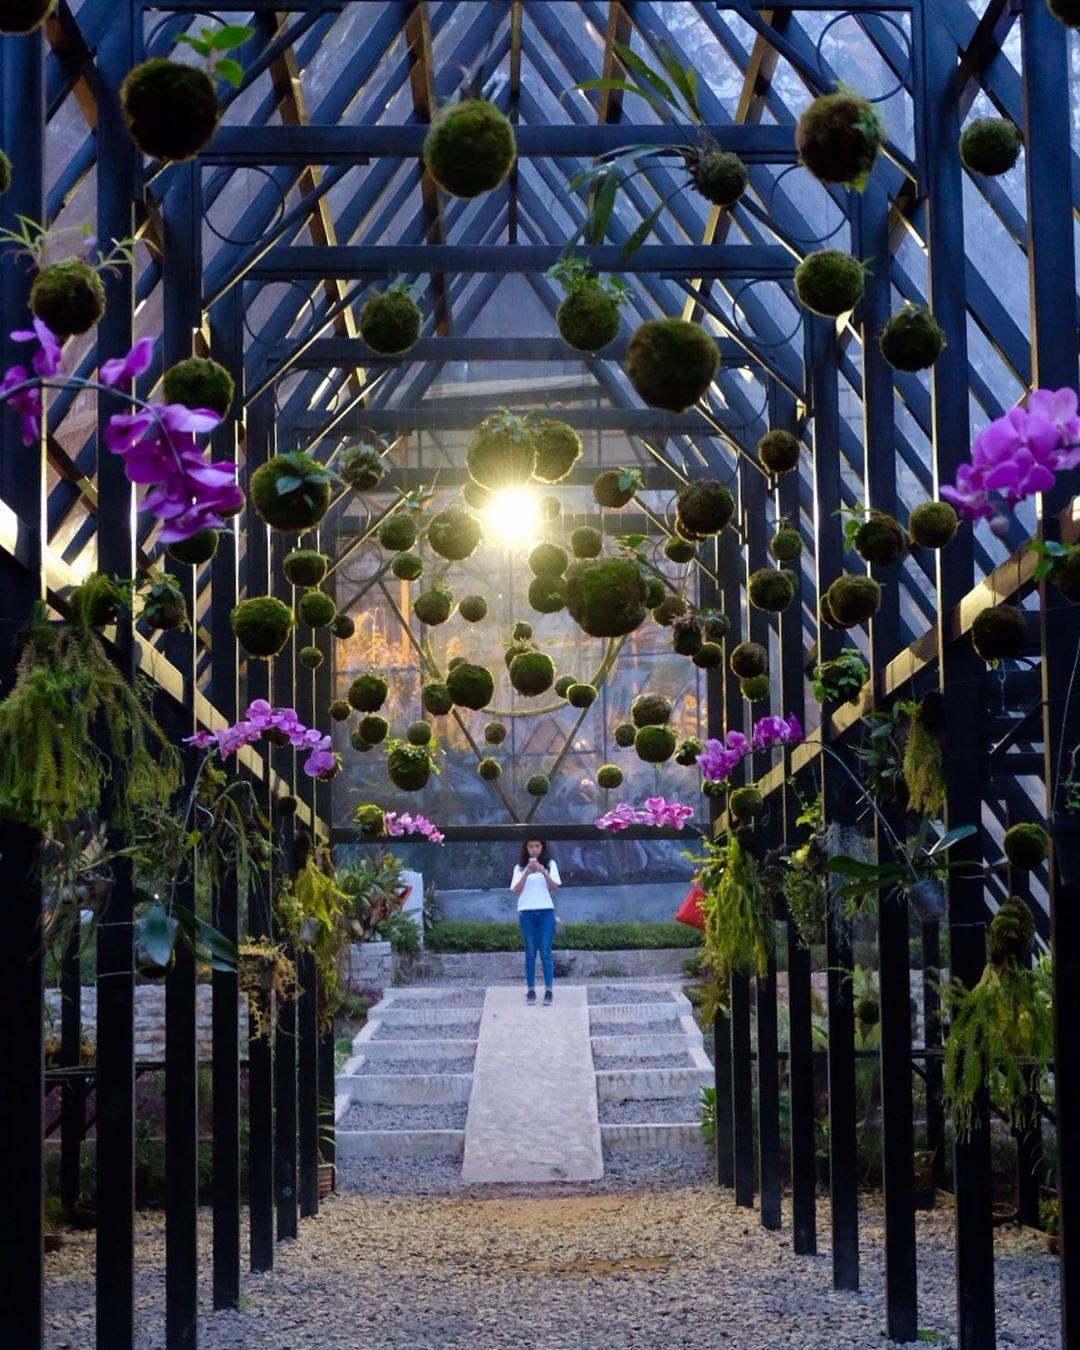 Taman Anggrek Orchid Forest Cikole